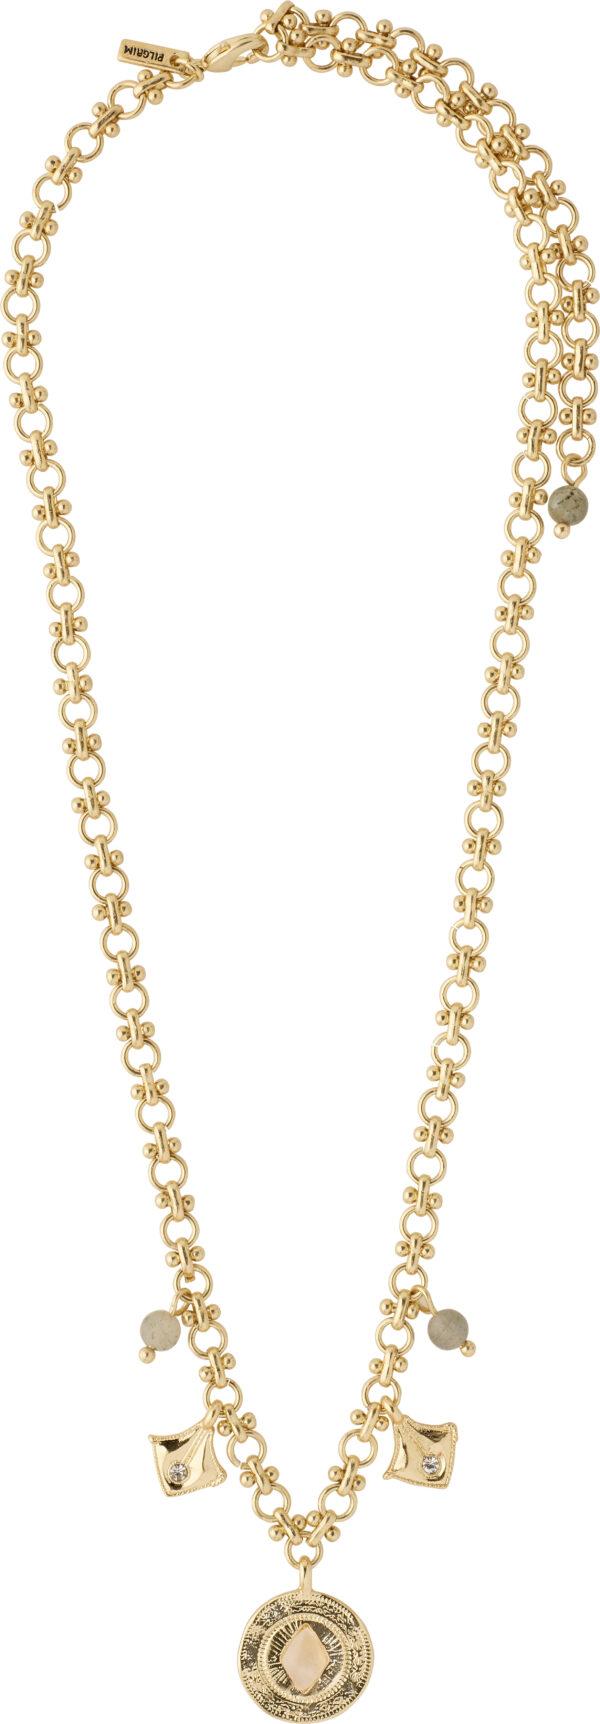 132122021 necklace nomad gold plated crystal karma pilgrim 2